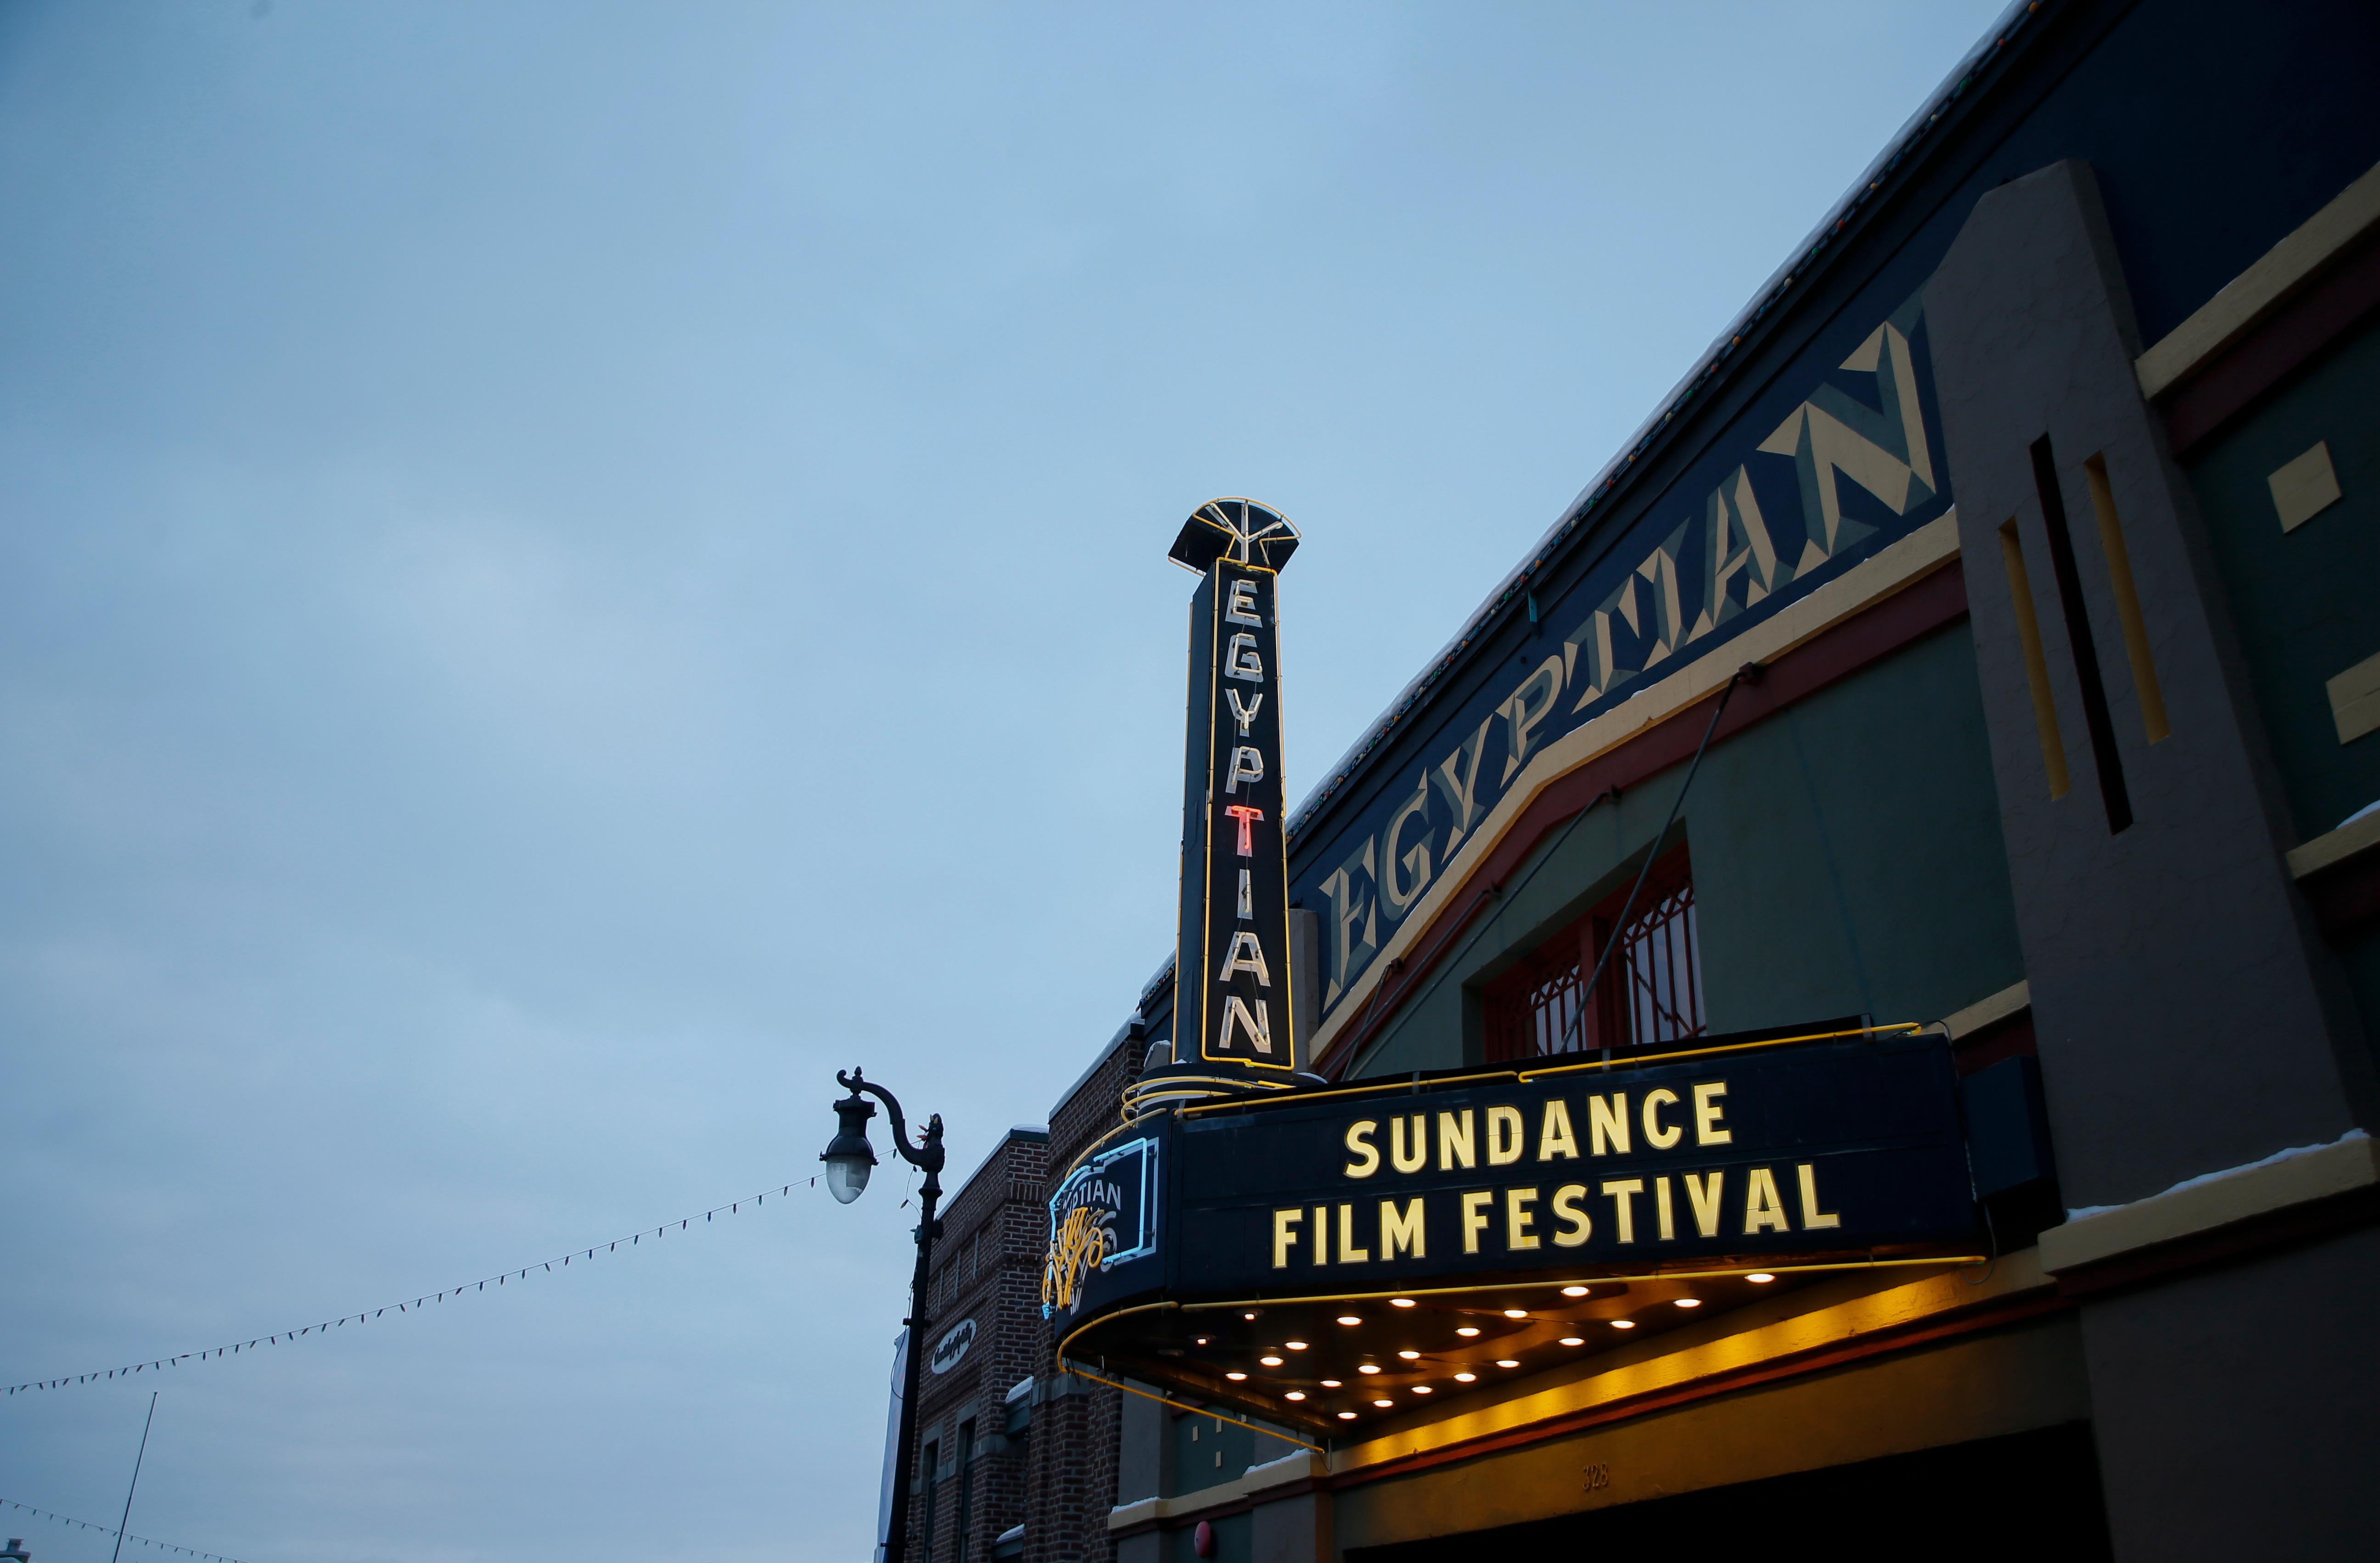 Sundance 2020 Juries Include Ethan Hawke, Dee Rees, Nanfu Wang, Isabella Rossellini, and More